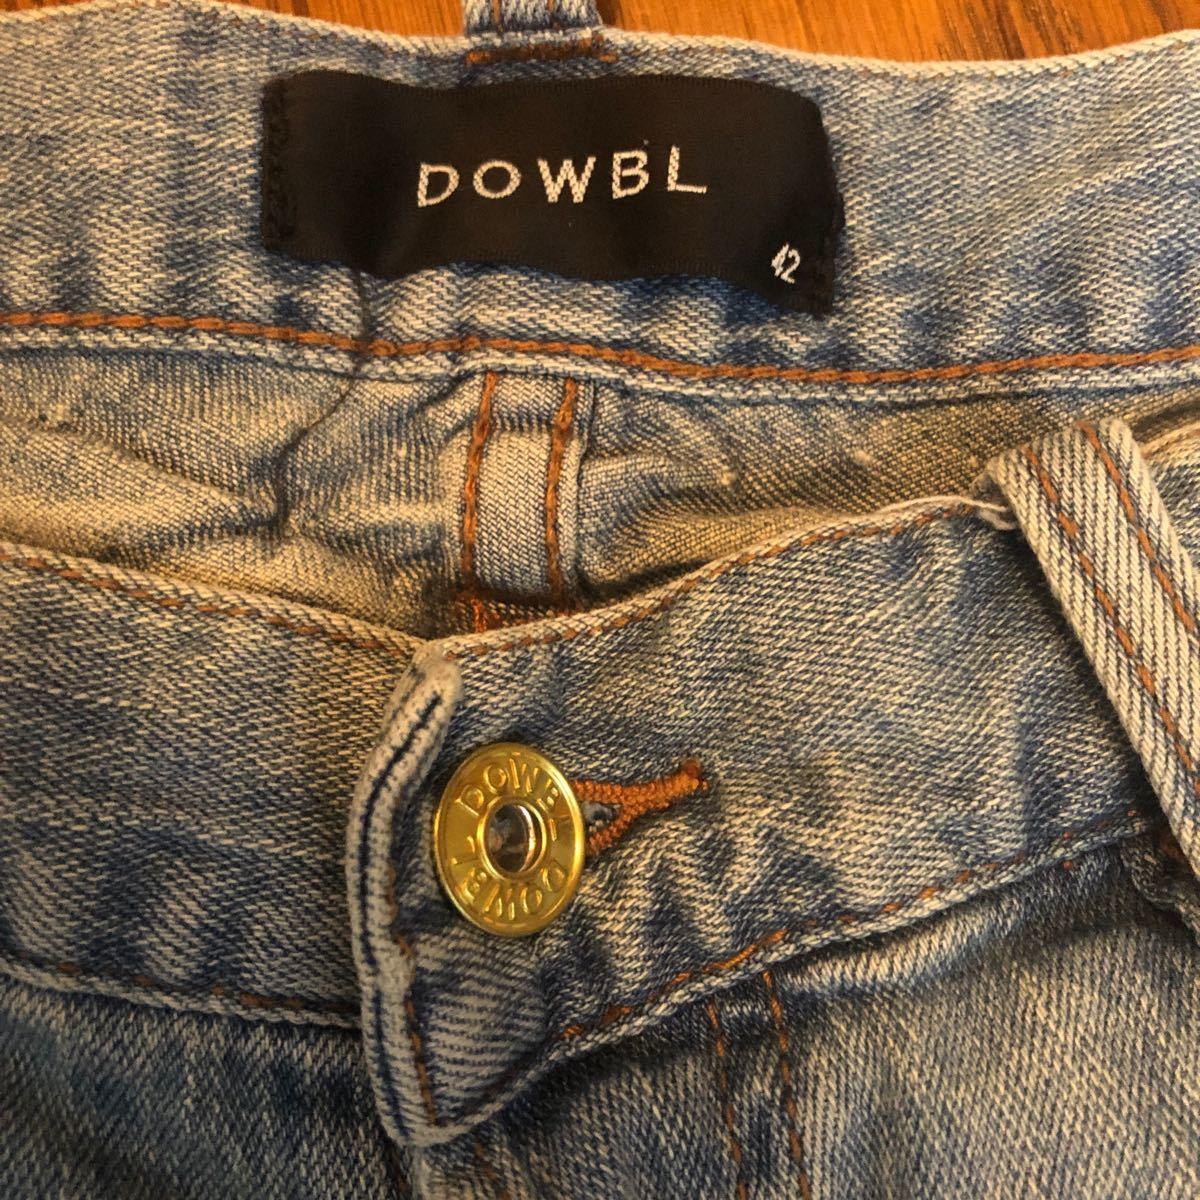 DOWBL ダブル デニム ジーンズ デニムパンツ ハーフパンツ メンズ109